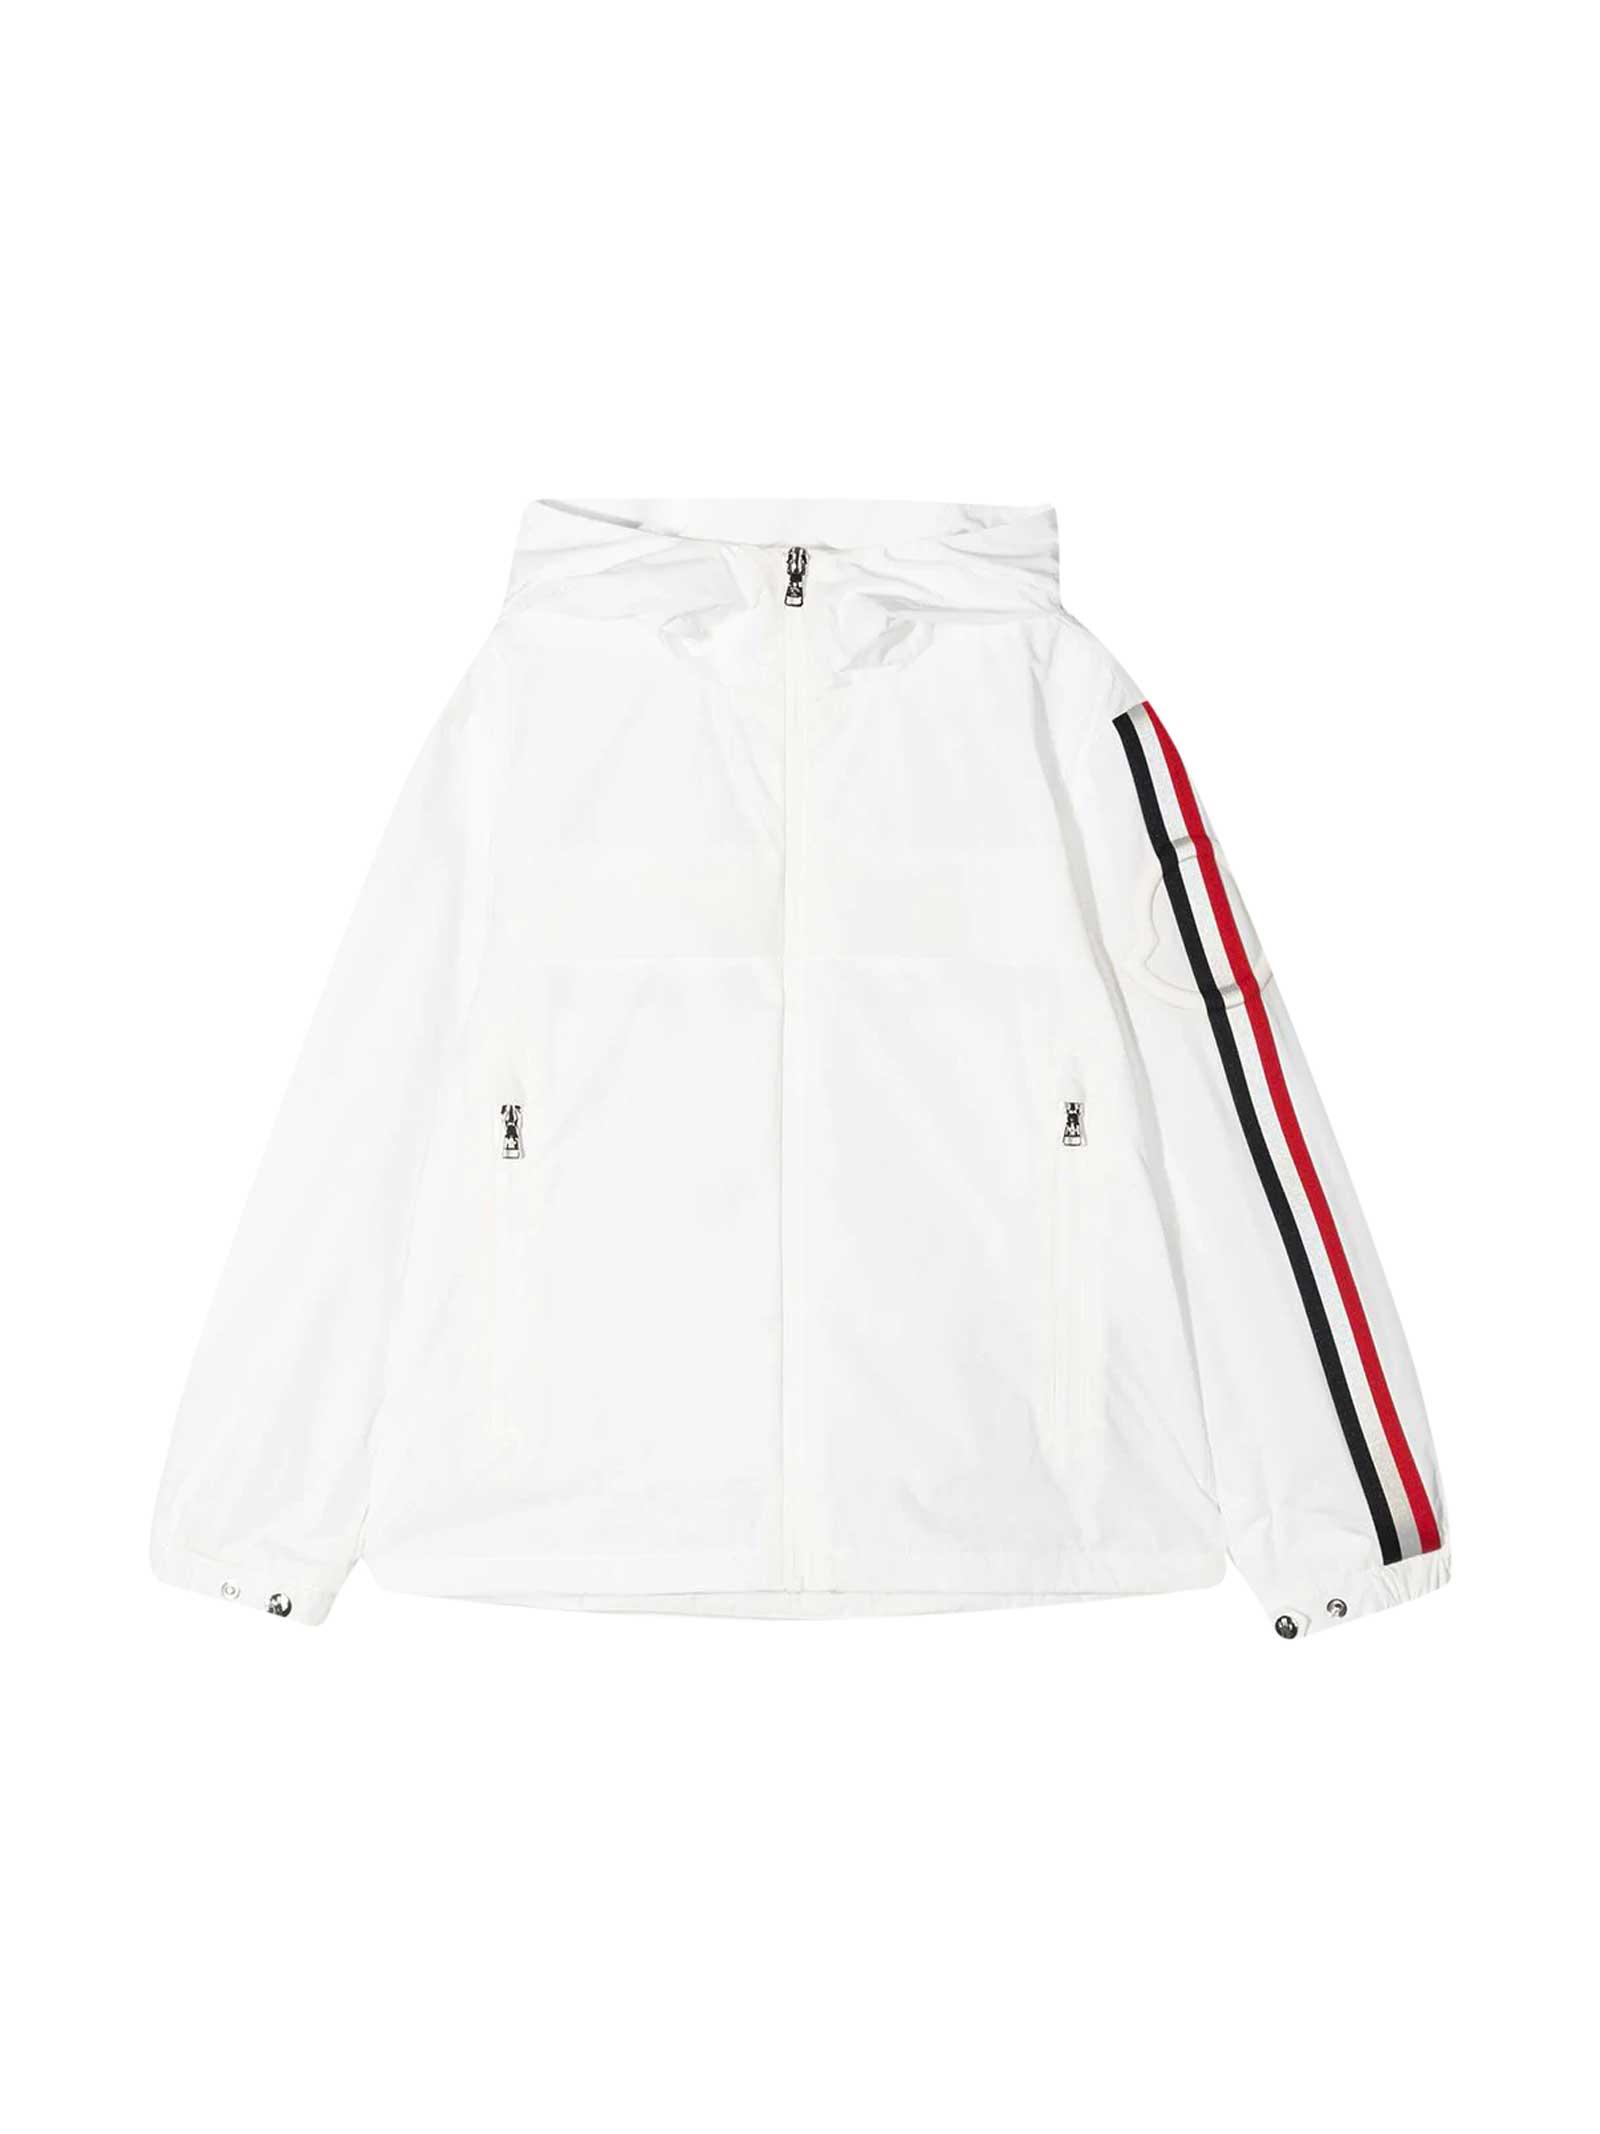 Moncler White Jacket